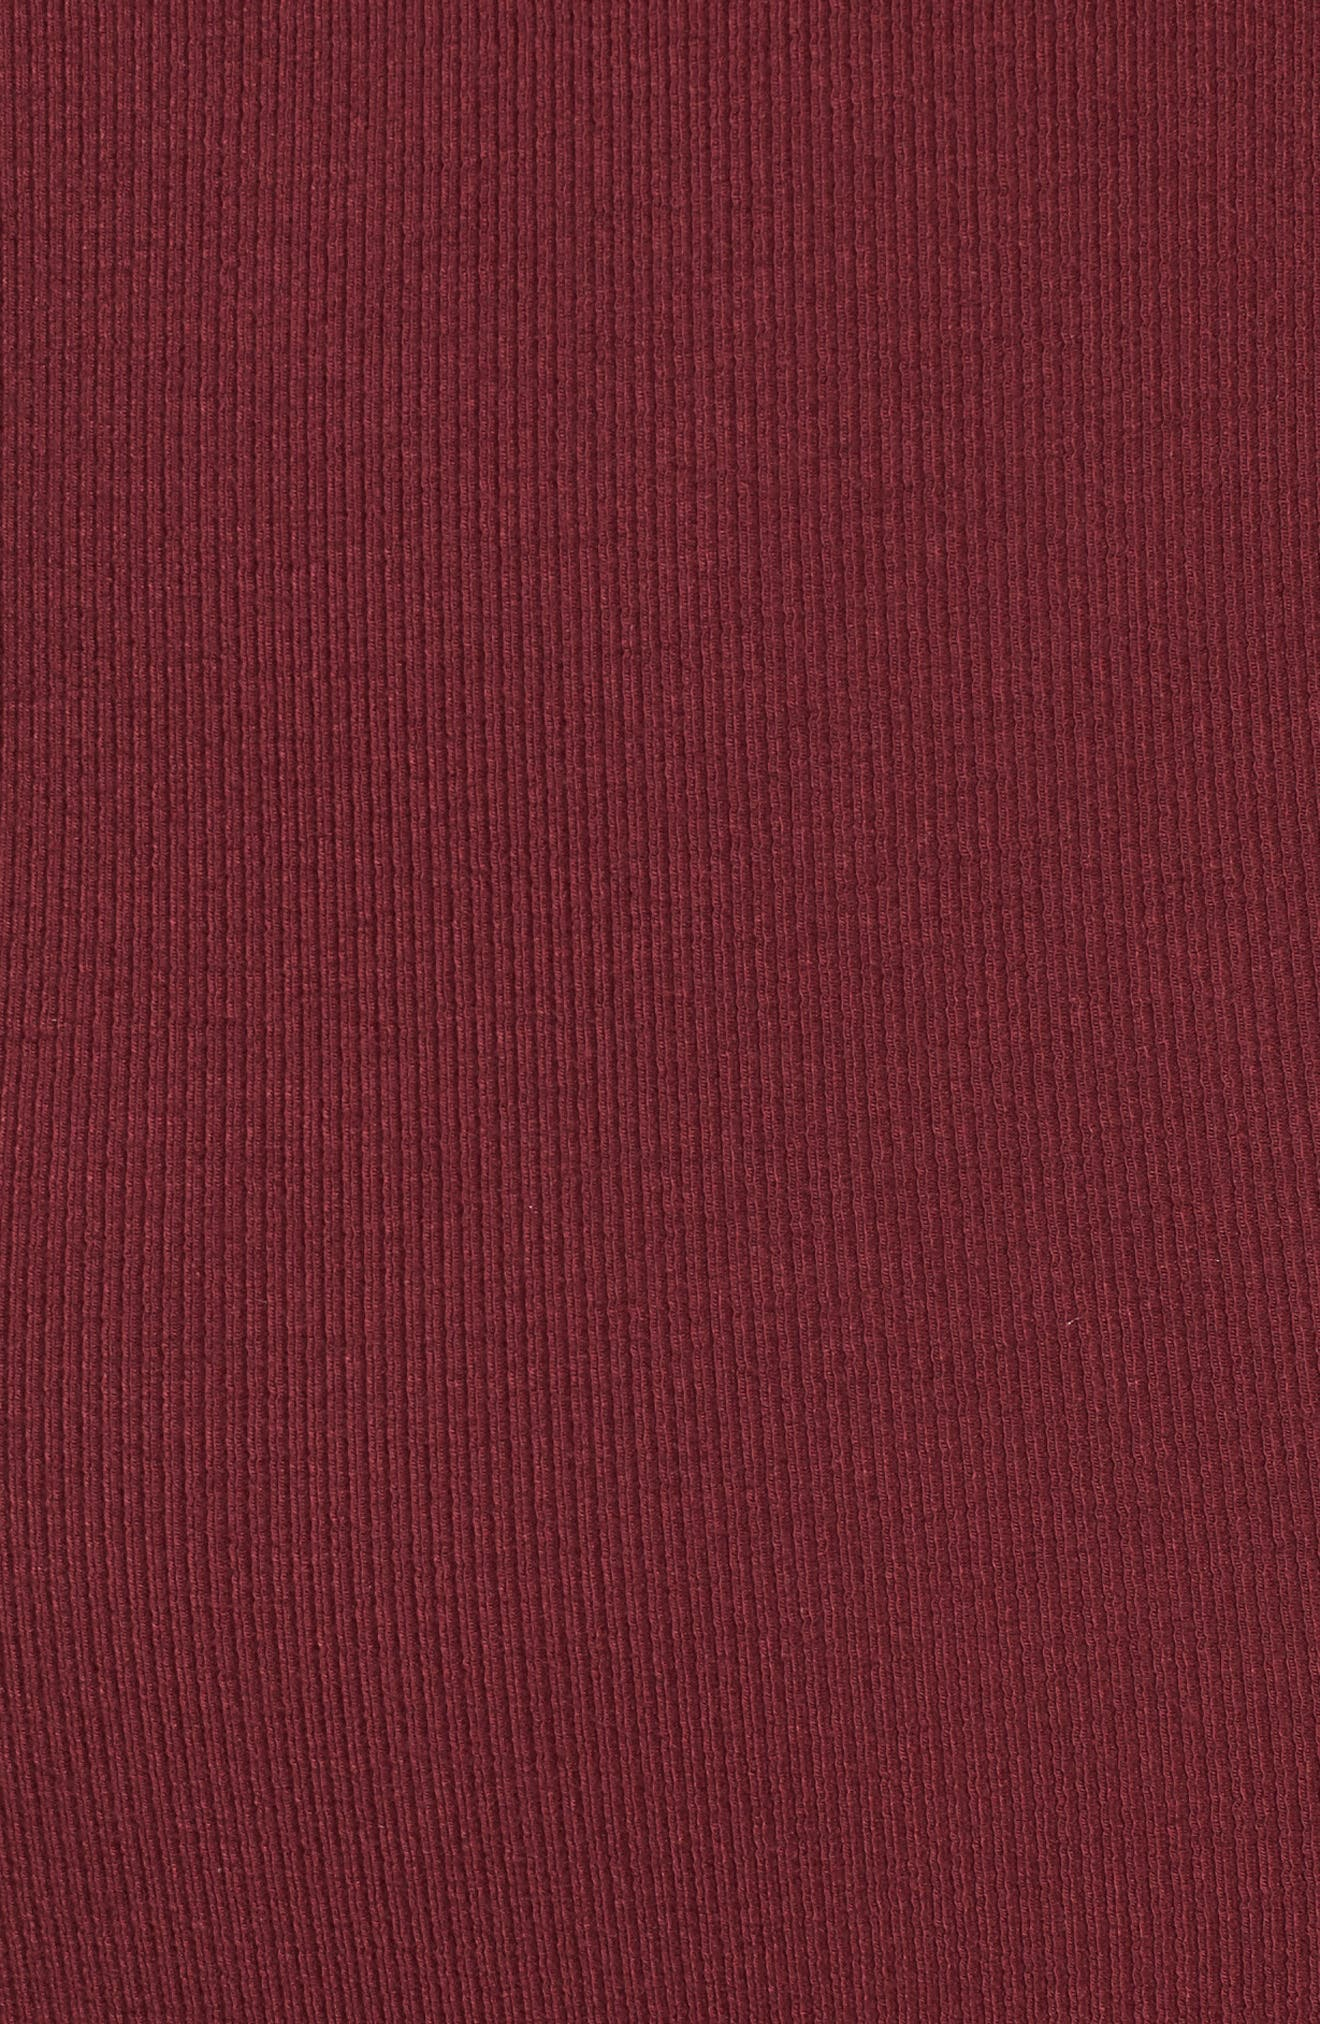 Thong Bodysuit,                             Alternate thumbnail 5, color,                             Burgundy